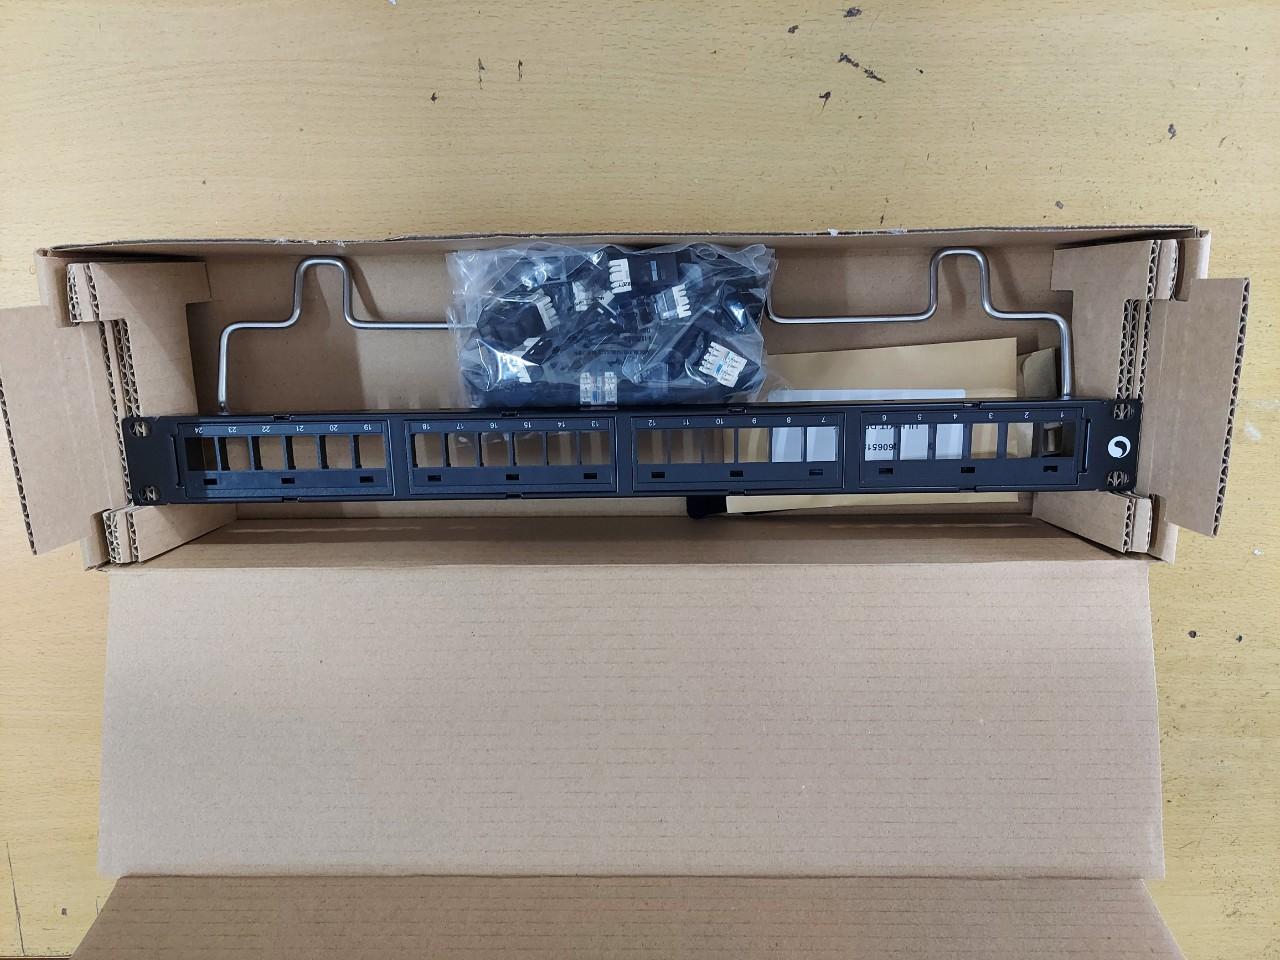 Patch Panel 24 port Cat6 Commscope 760237040, 9-1375055-2